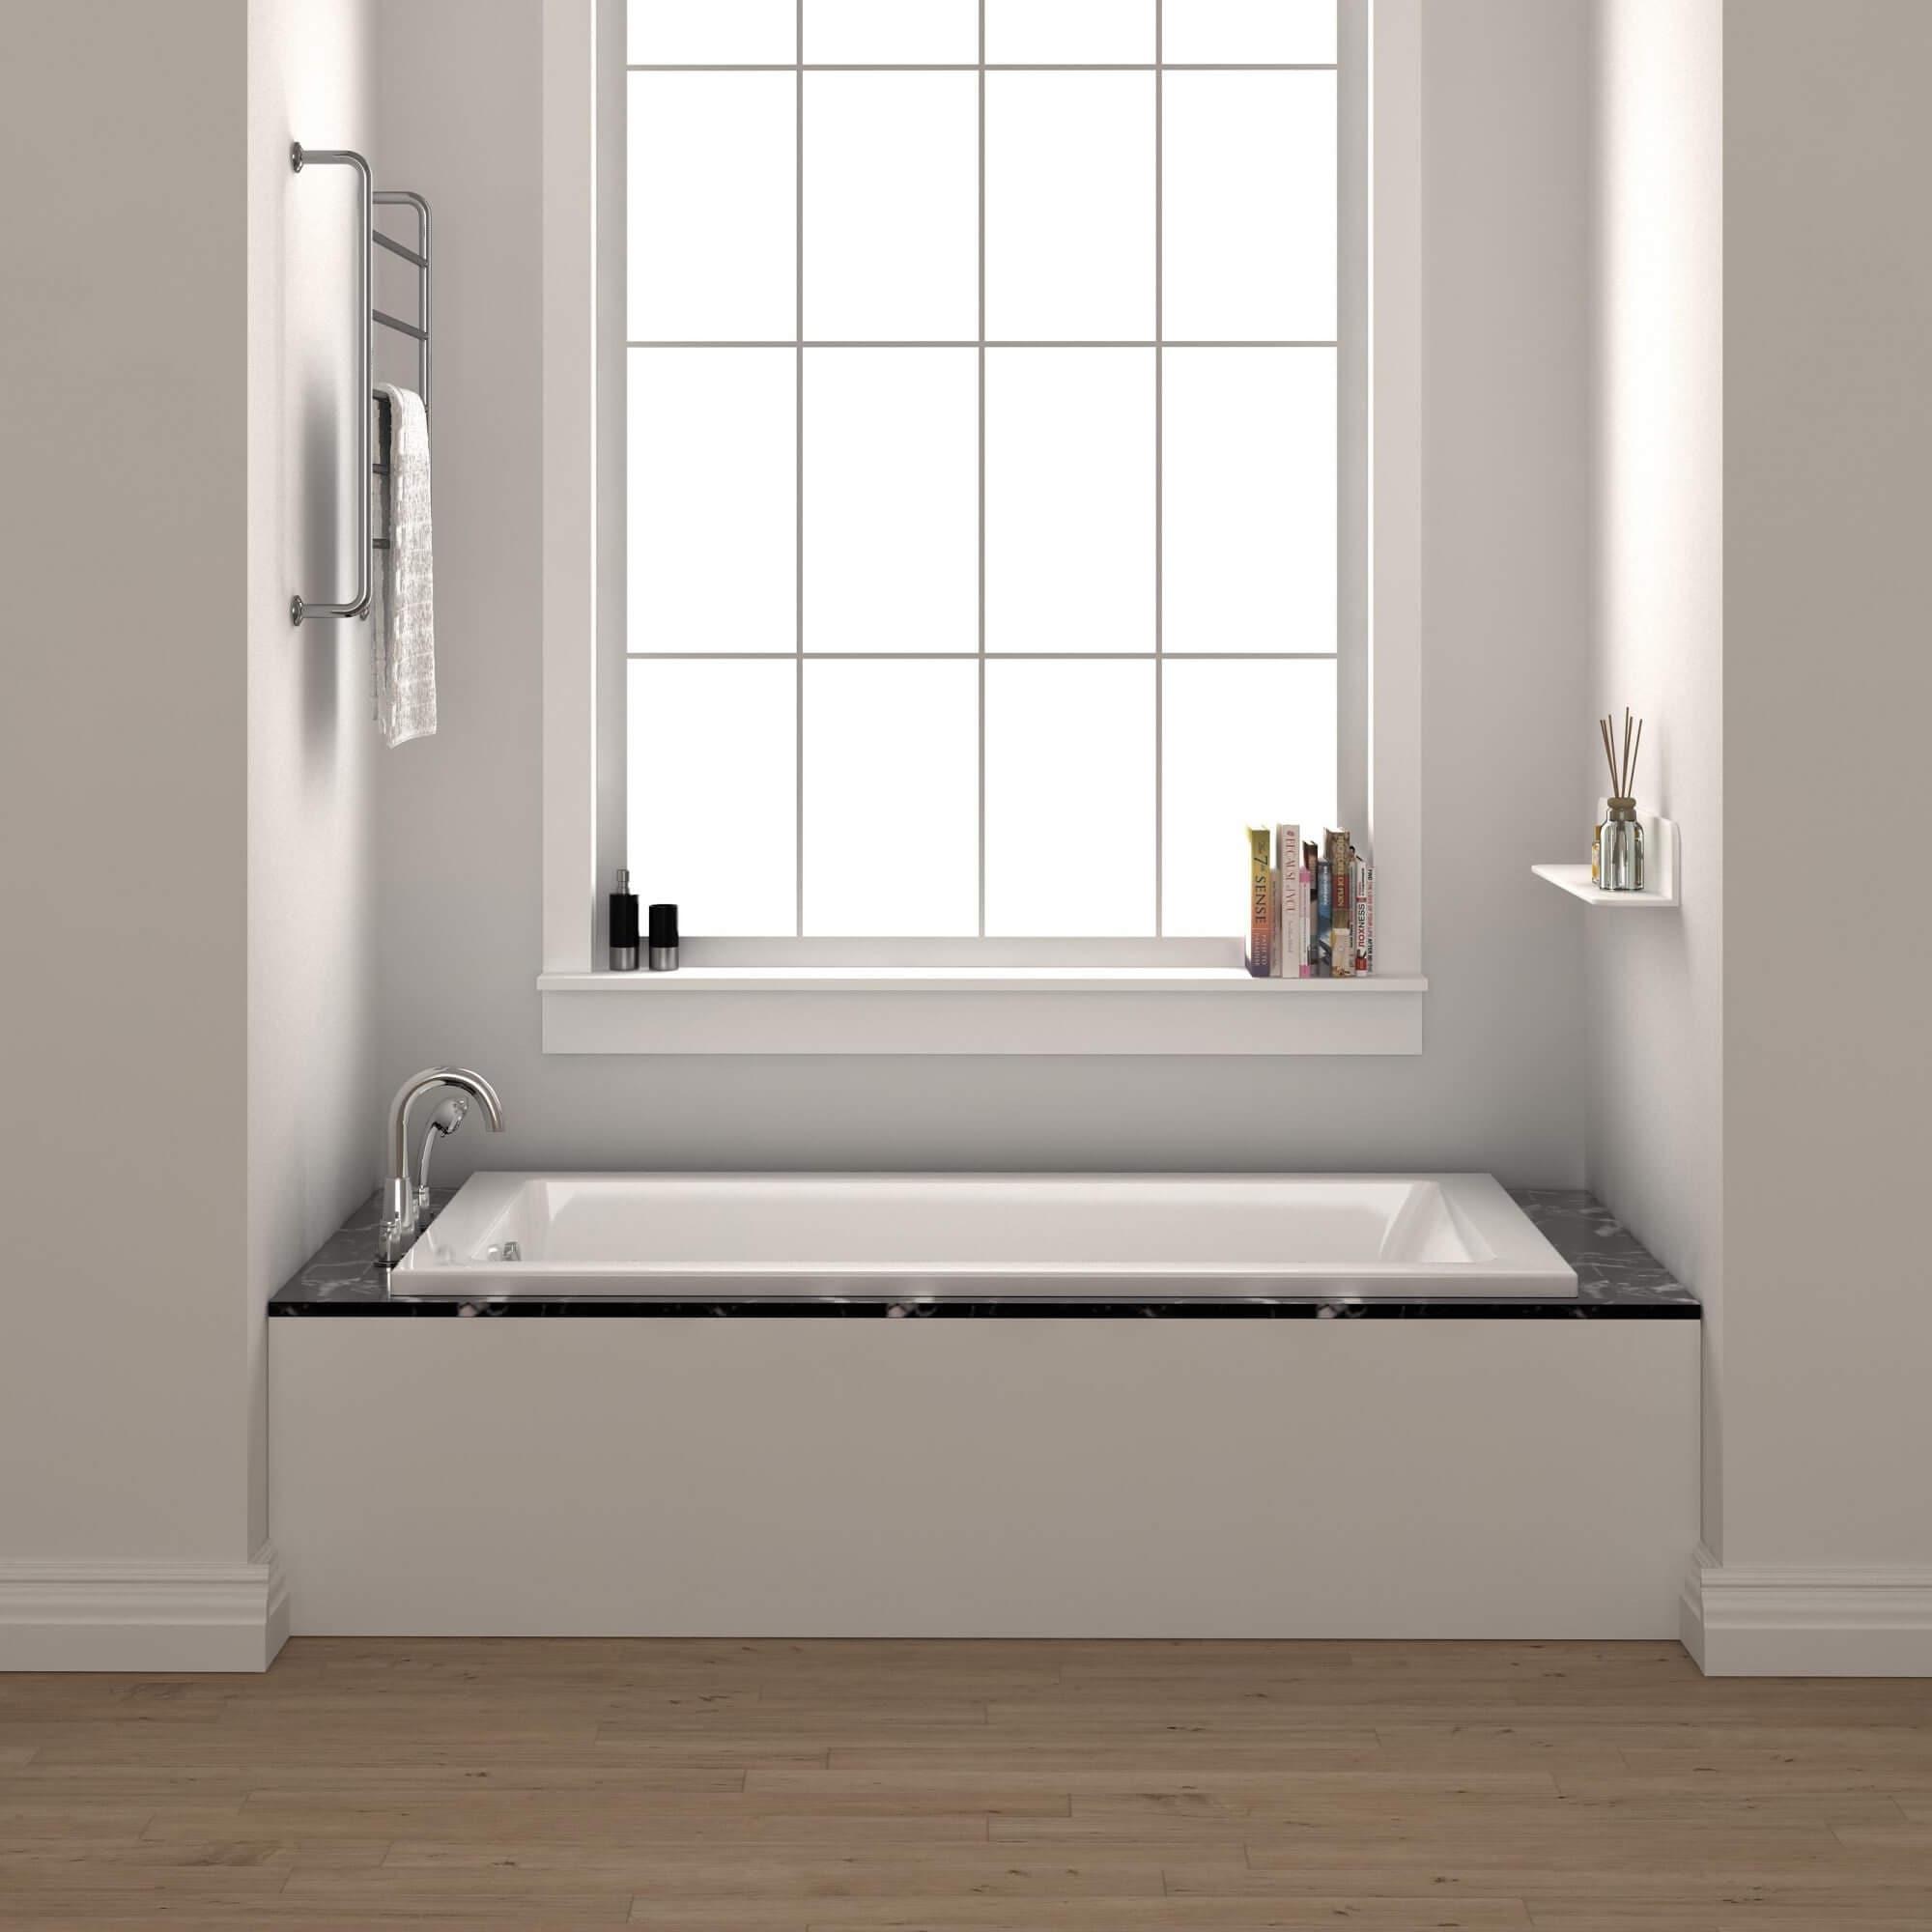 Shop Black Friday Deals On Fine Fixtures Drop In Soaking Bathtub Fiberglass Acrylic Material Overstock 11111602